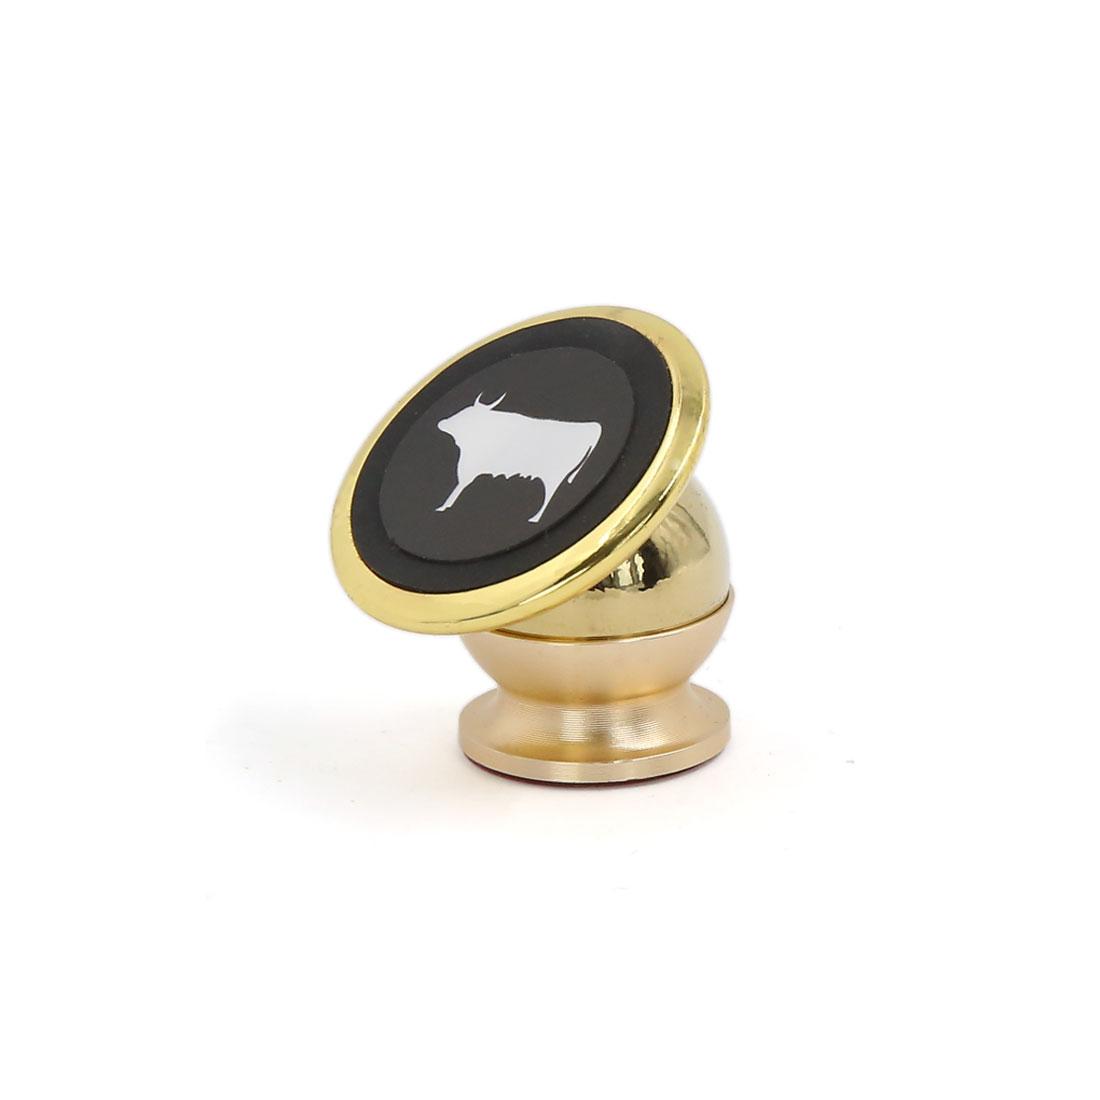 360 Degree Rotating Magnetic Car Dash Mount Ball Holder for Phone Tablet GPS